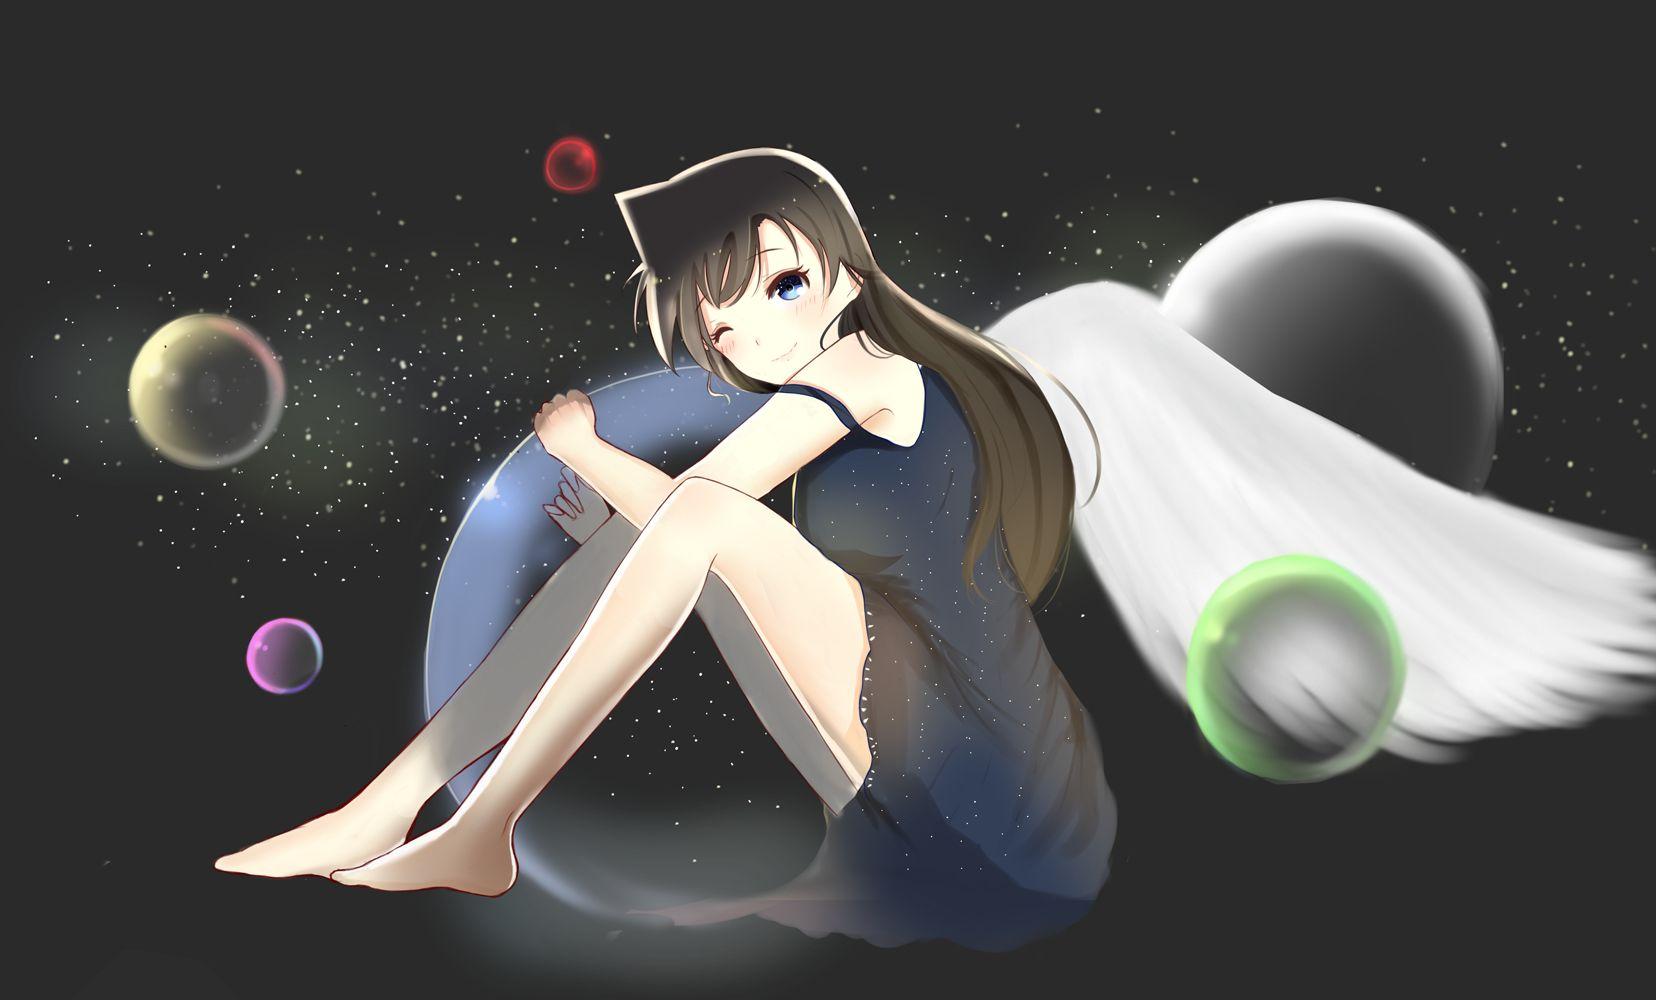 Anime image by Joud on Ran Mouri Anime wallpaper, Anime